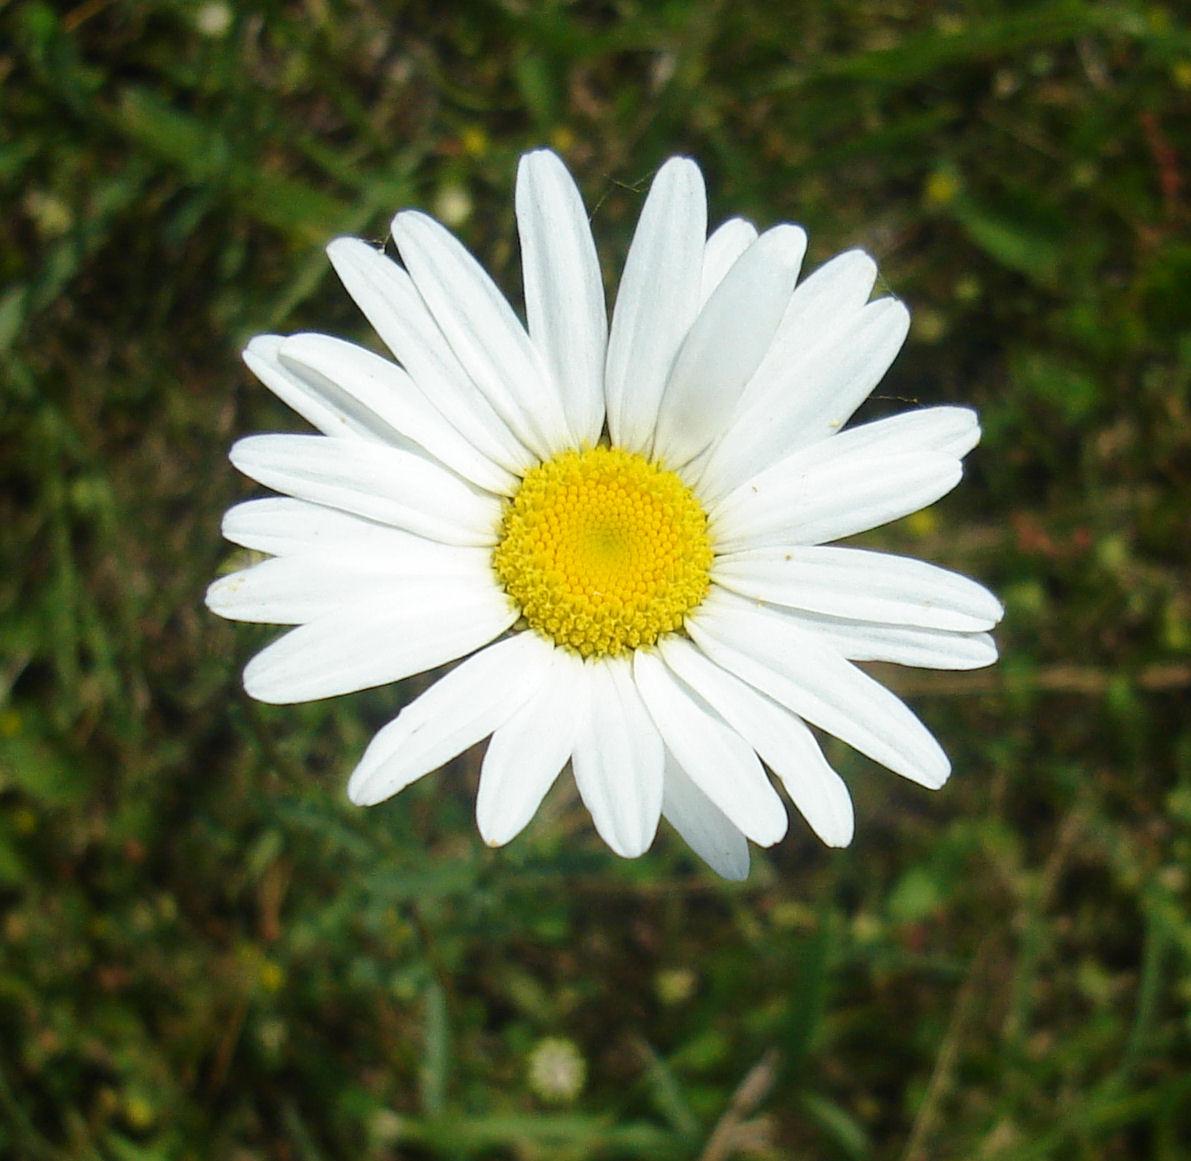 A Nogglestead wildflower